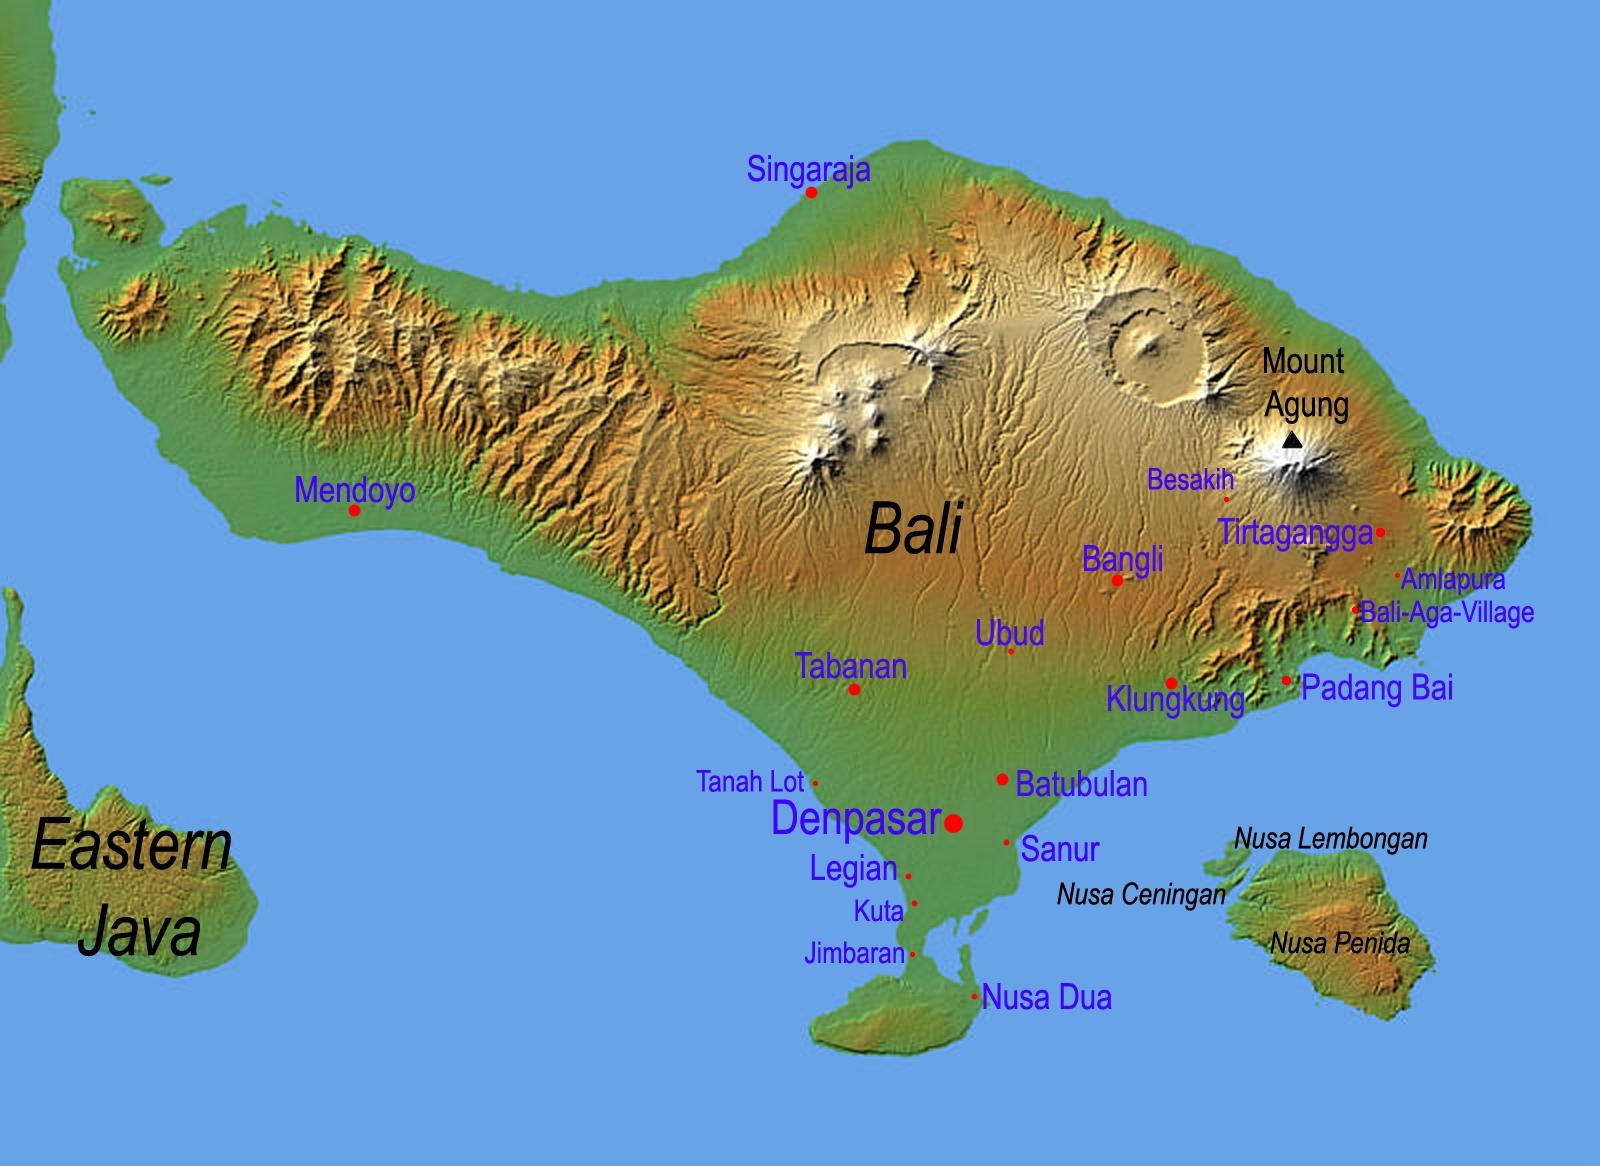 Bali_Labeled_map